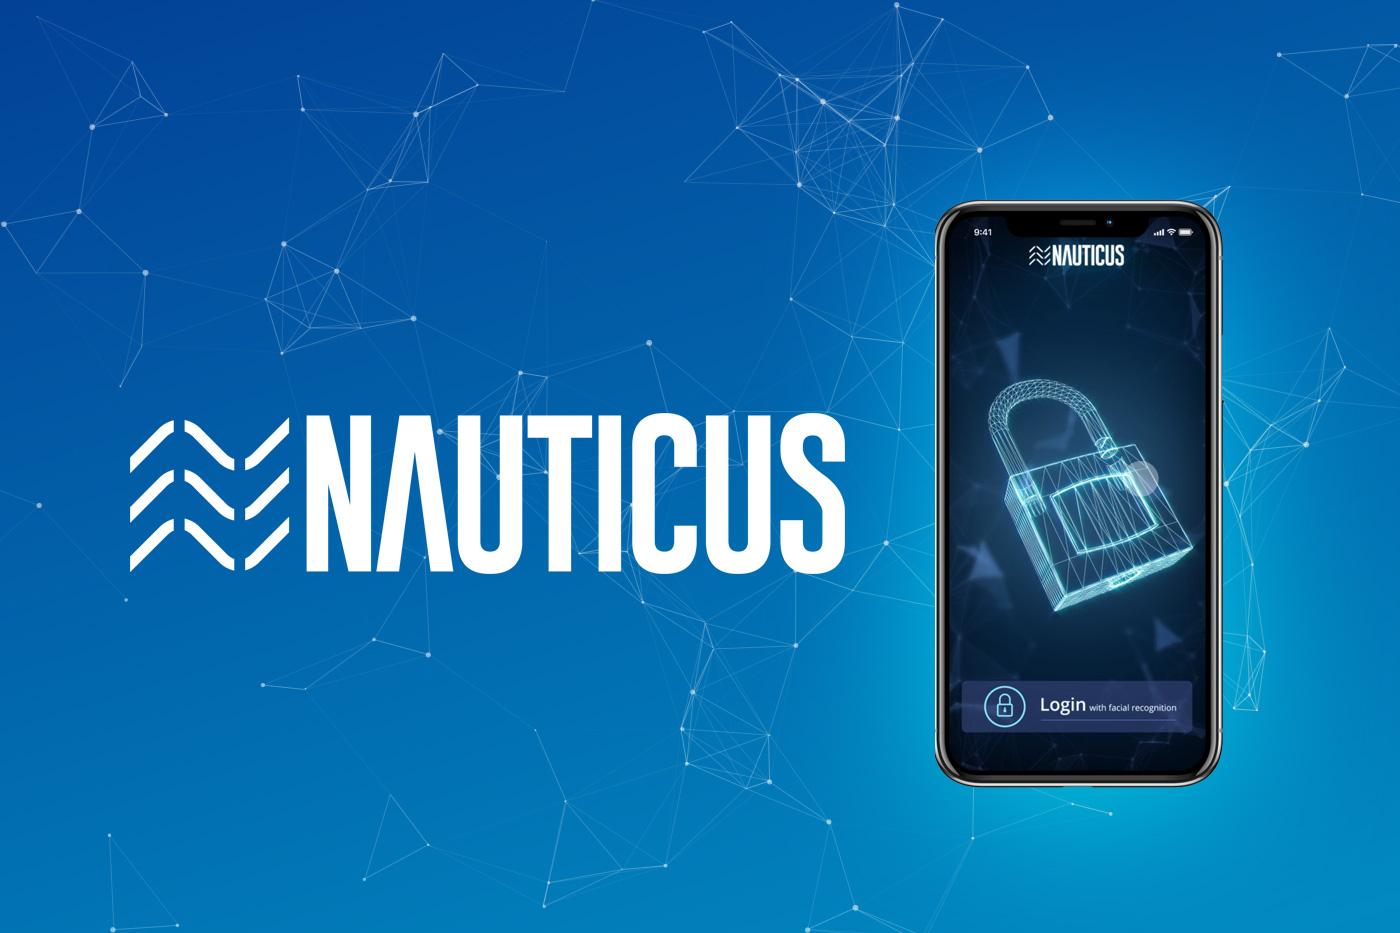 nauticus-guide.jpg